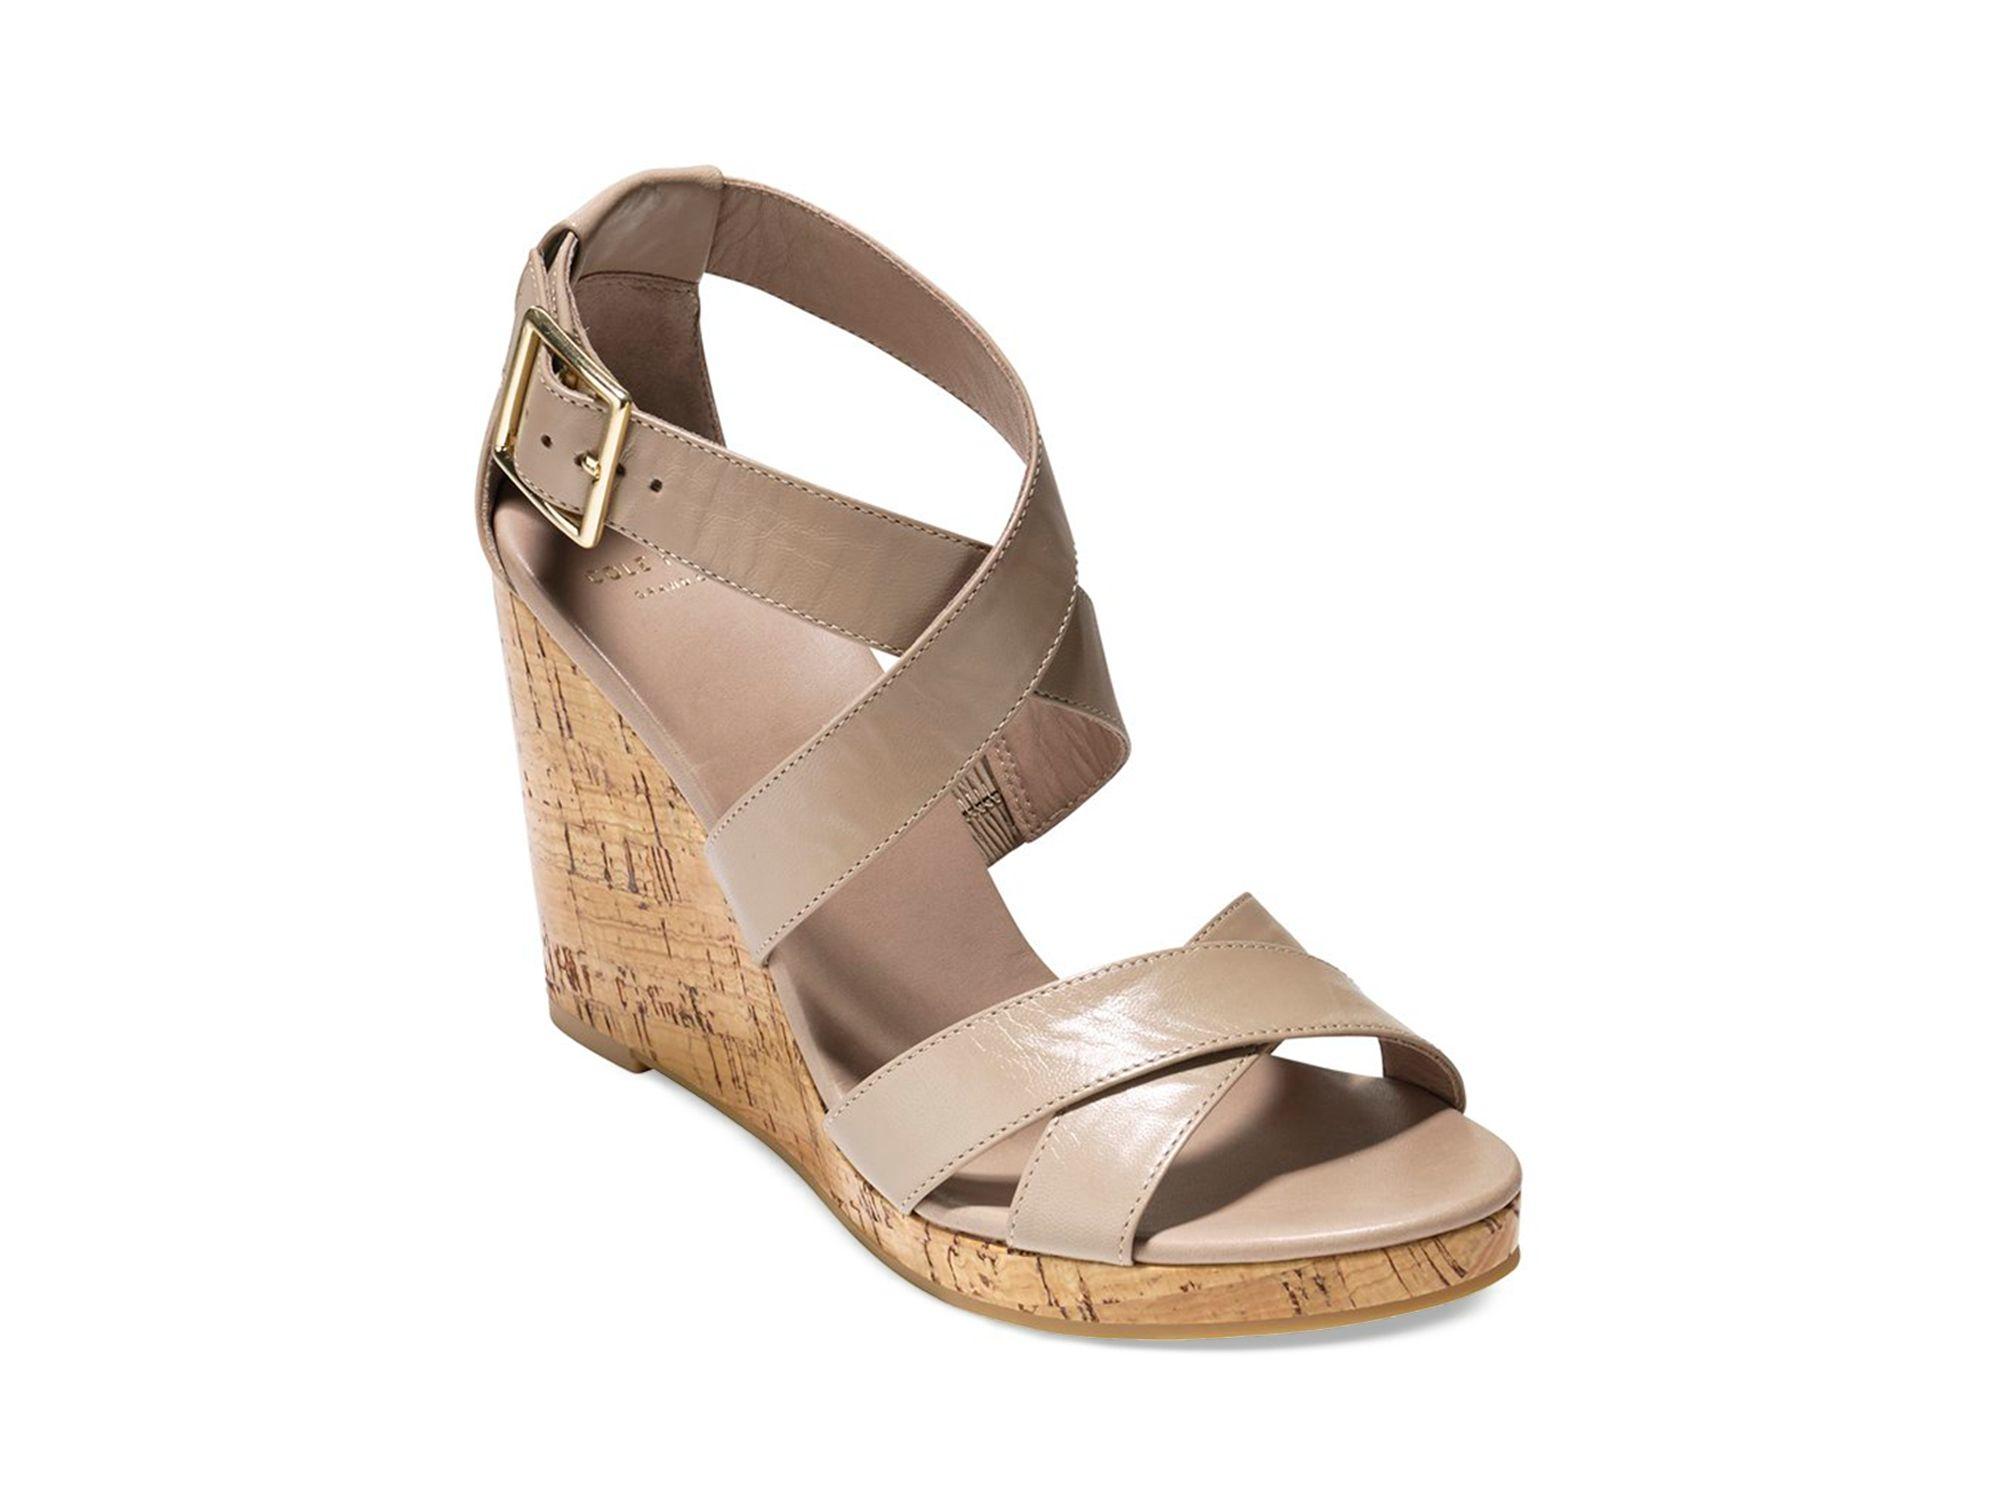 4fbaca5122e Lyst - Cole Haan Wedge Sandals - Jillian in Natural